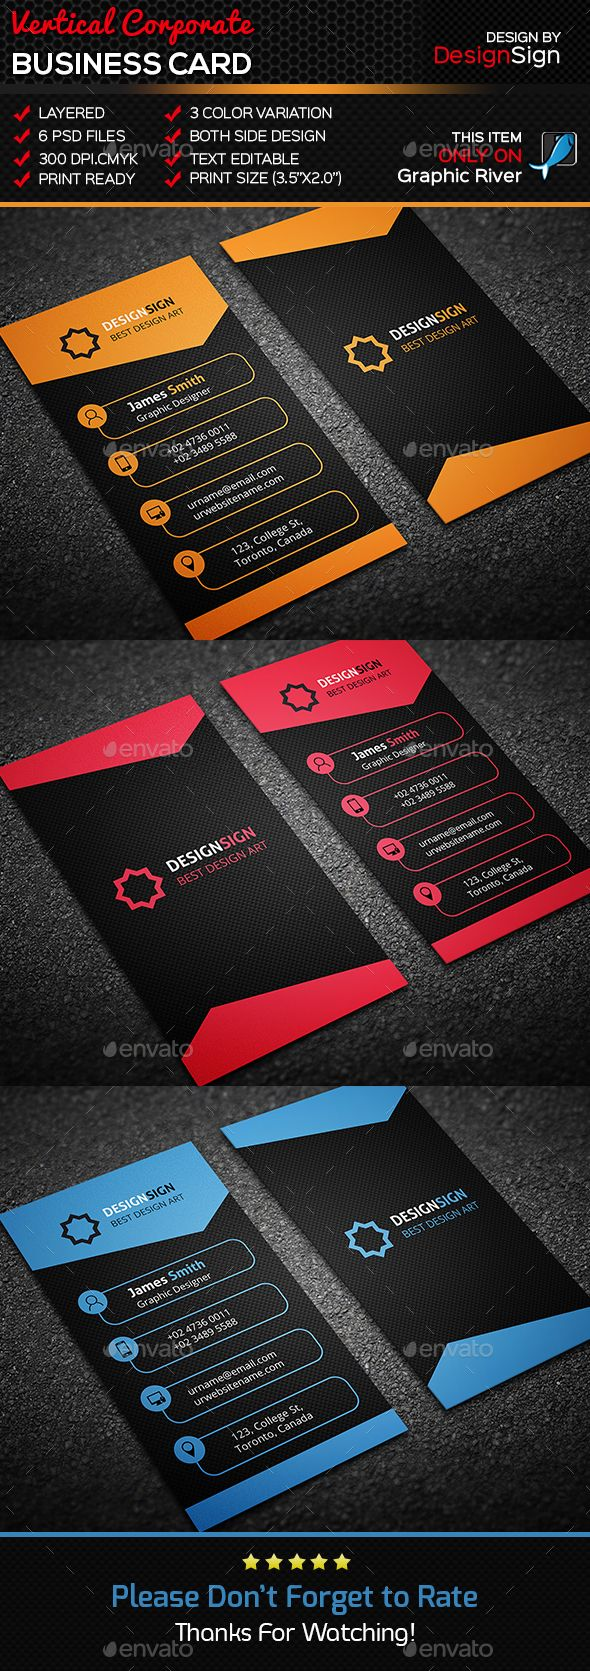 283 Best Business Card Images On Pinterest Business Card Design